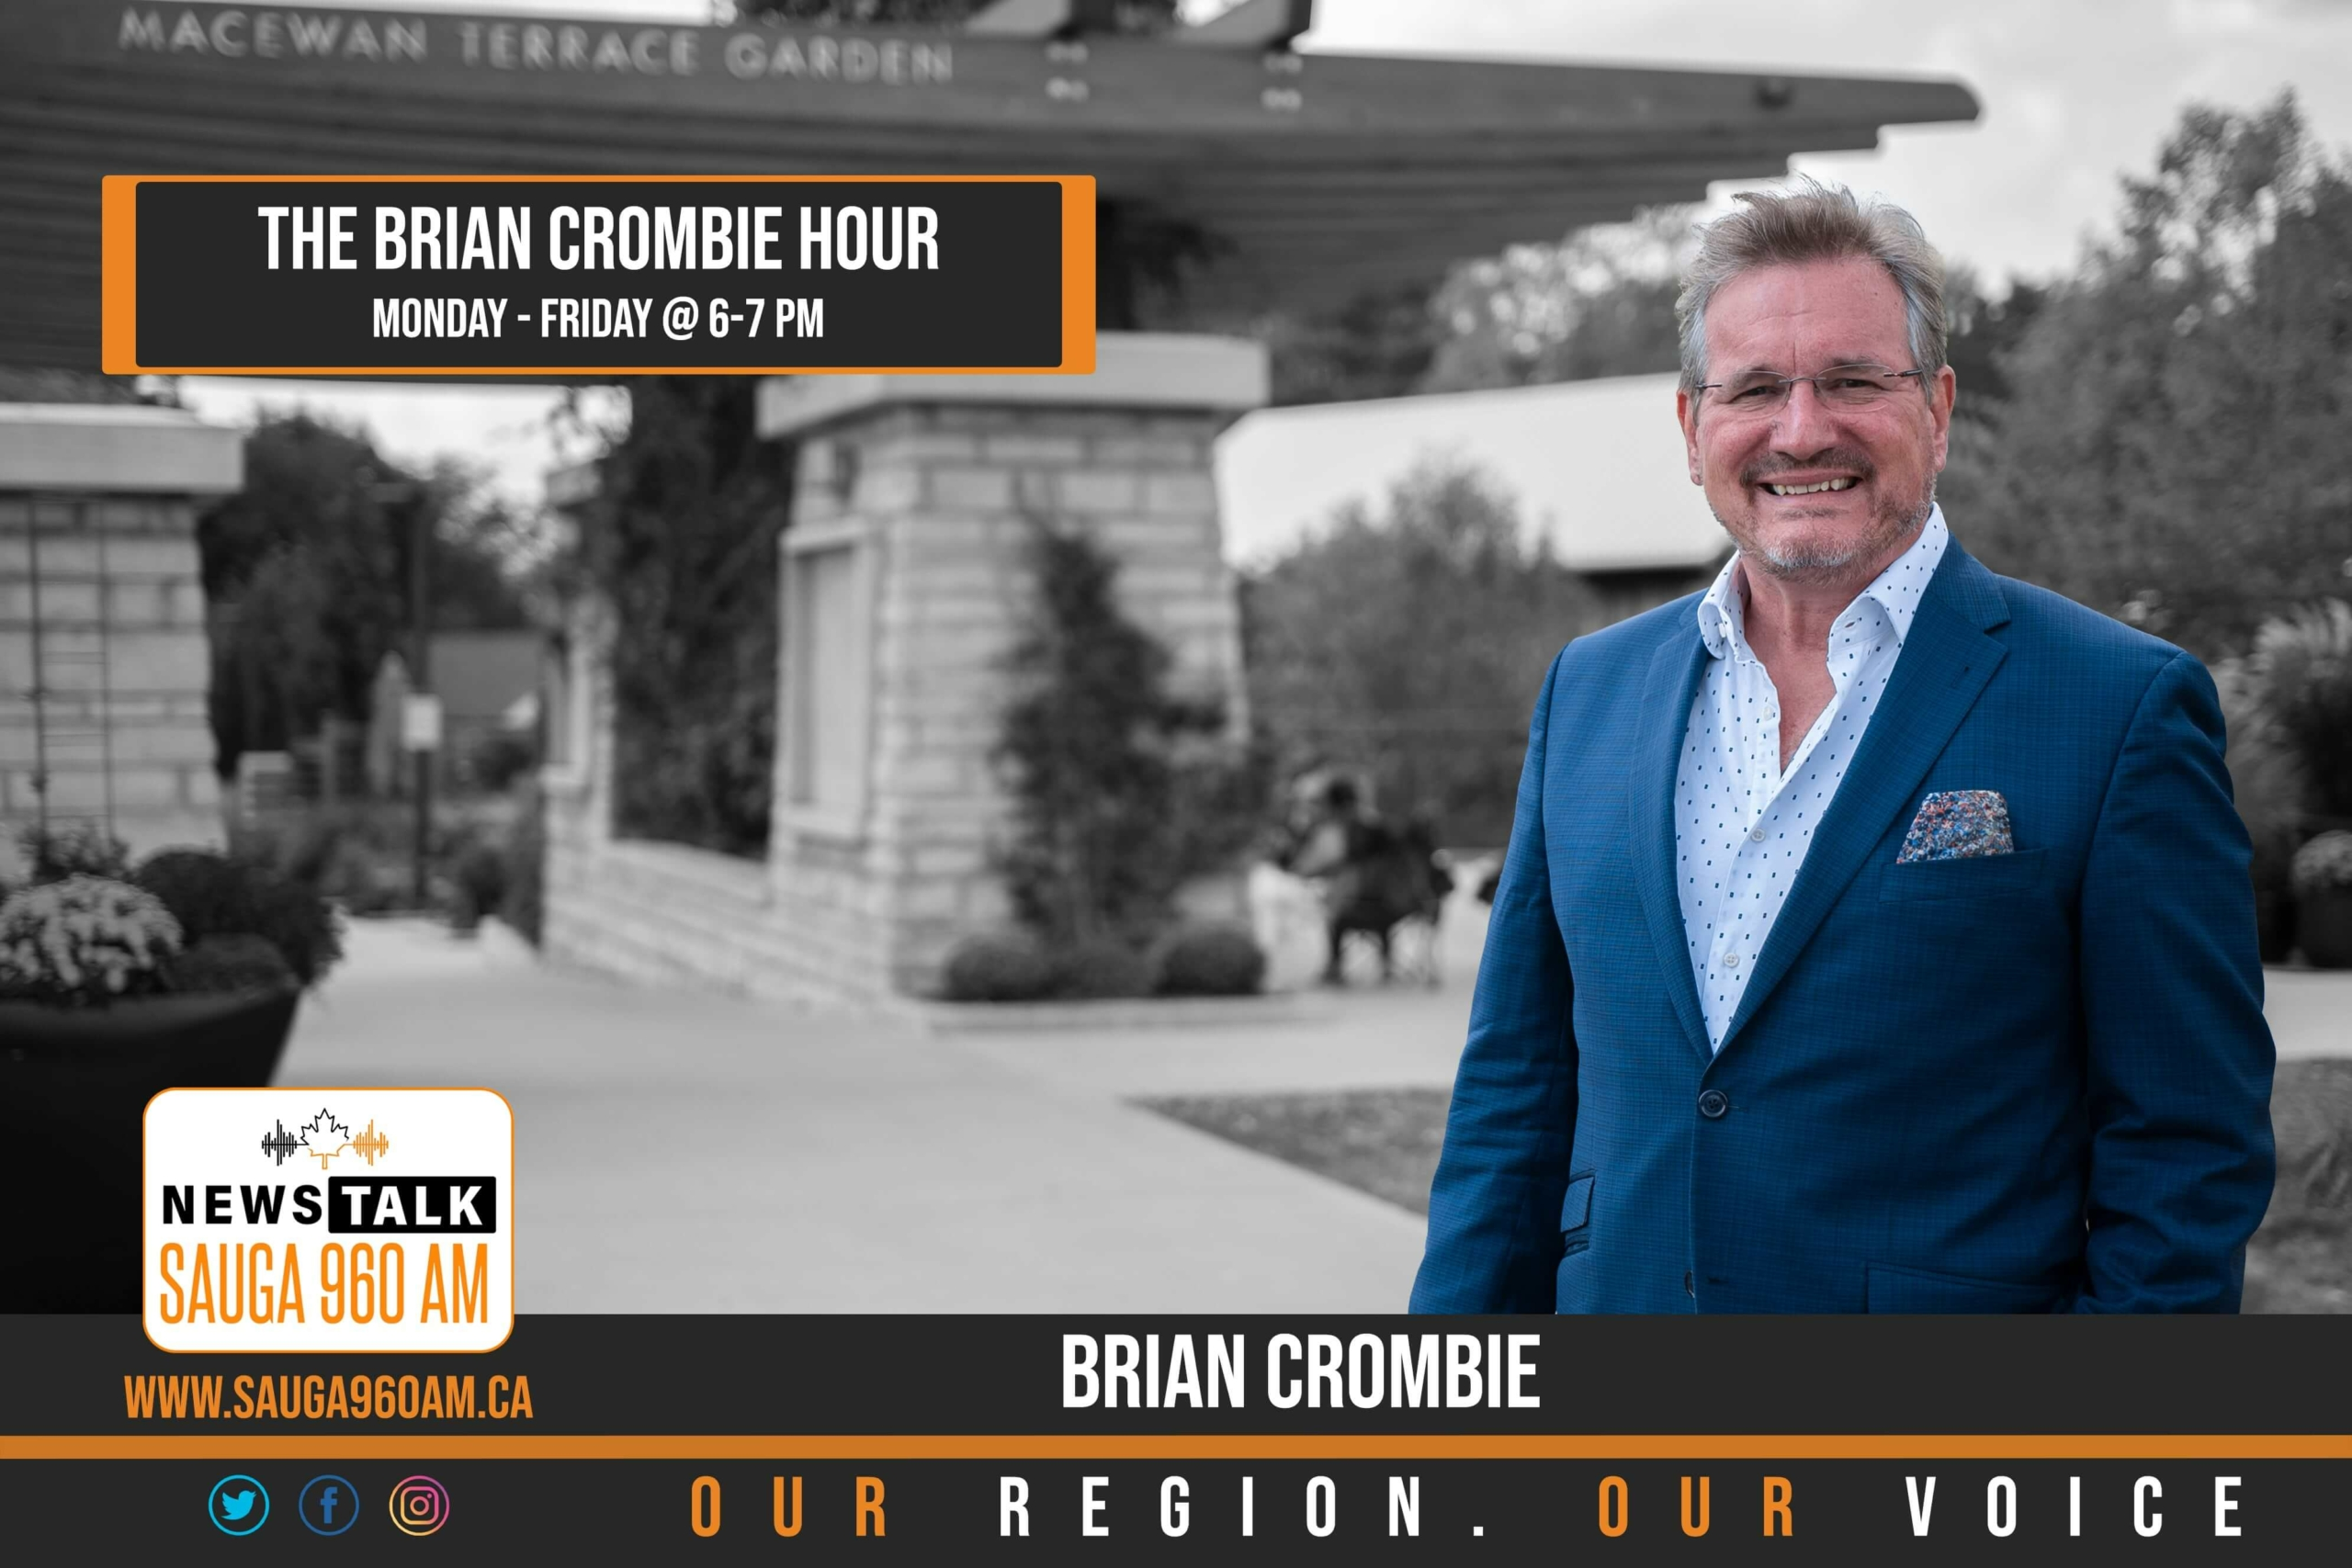 Brian Crombie hour